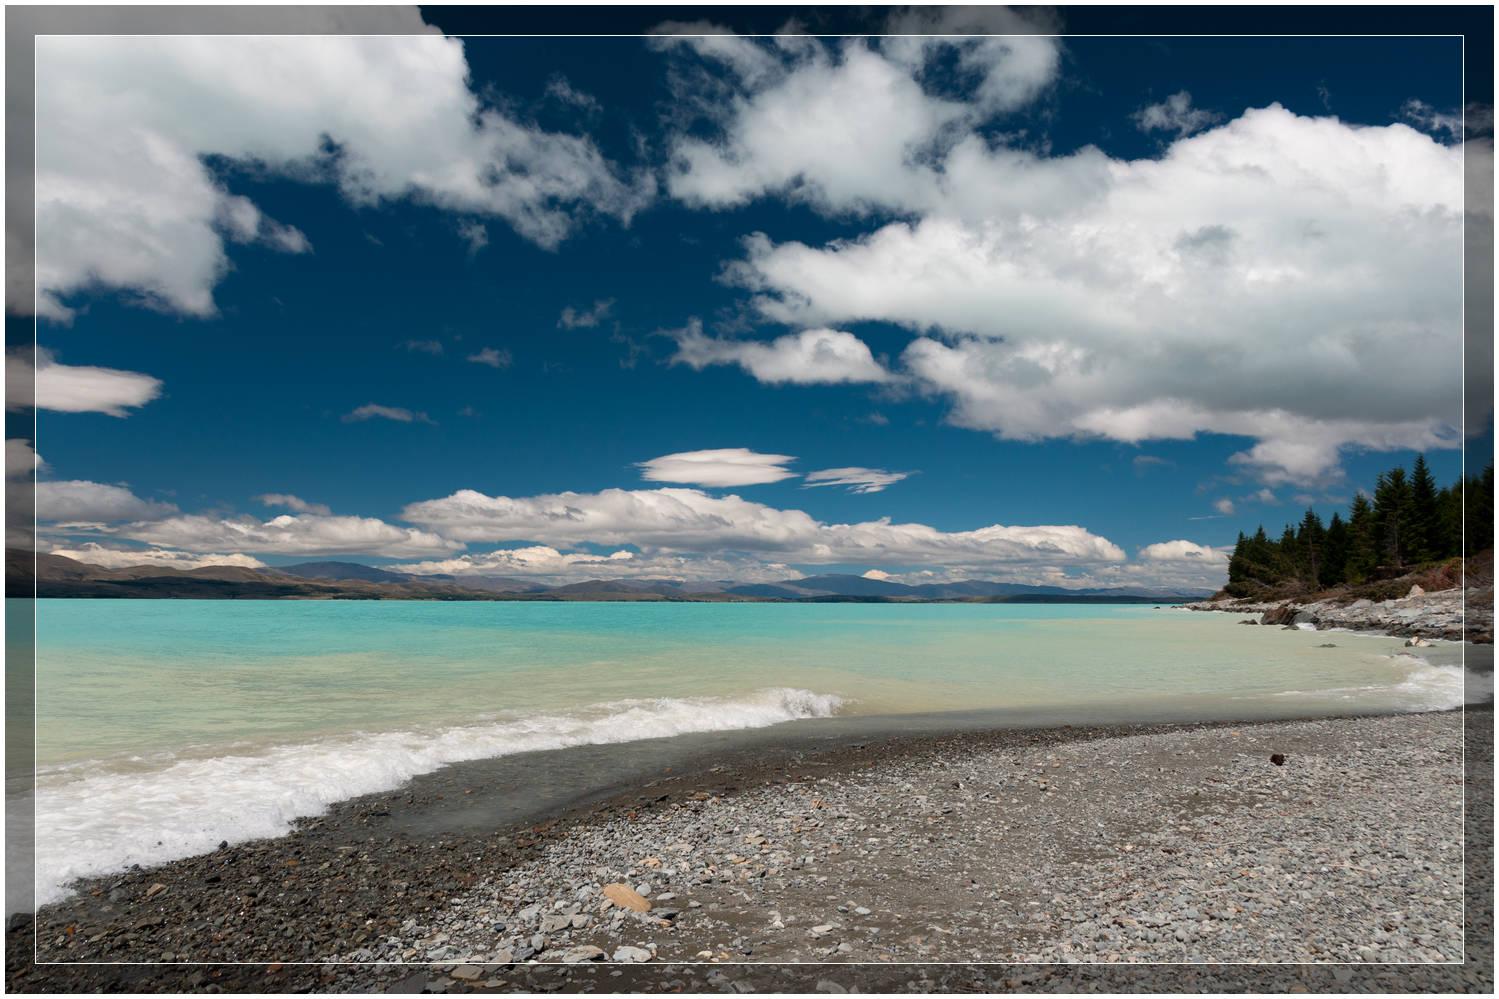 Big Skies @ Lake Pukaki, New Zealand